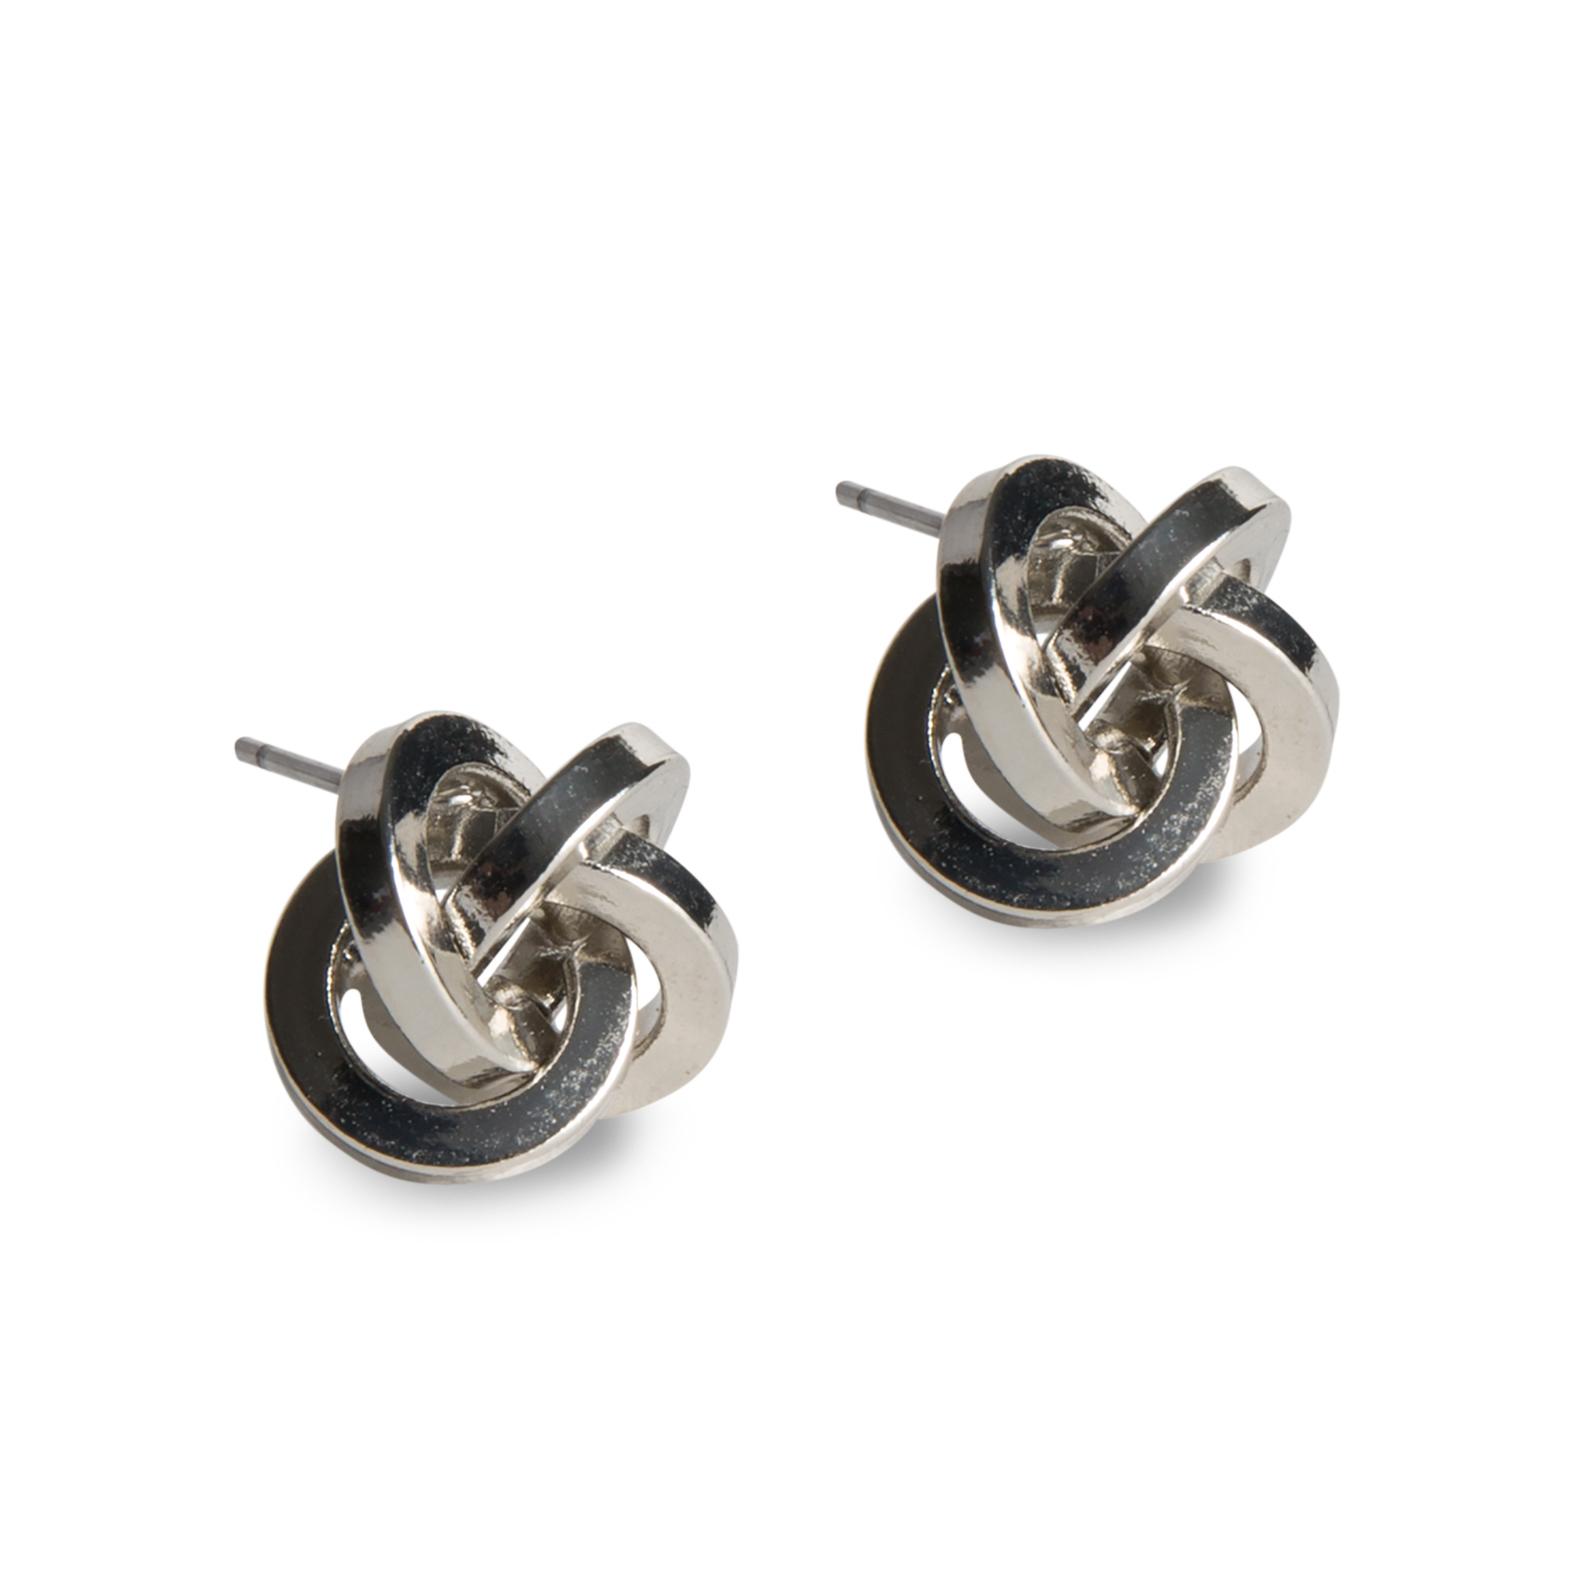 Damsmycke pfg Stockholm Pearls for Girls-Knot Earring 96229-02